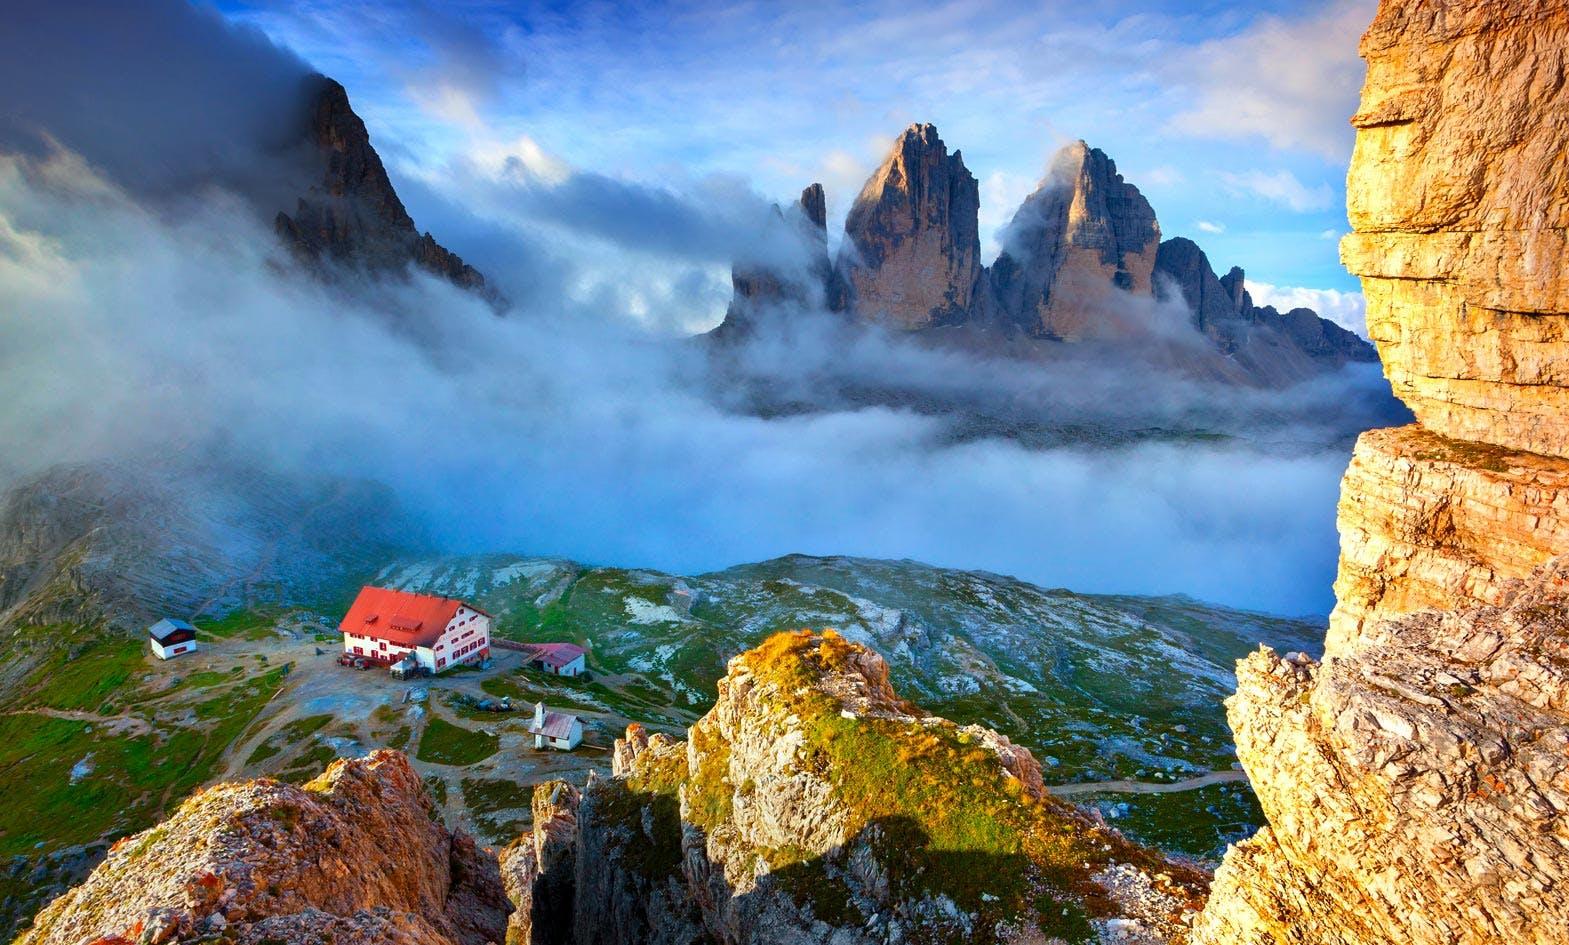 Dolomites Hut-to-hut Hiking Tours and Travel